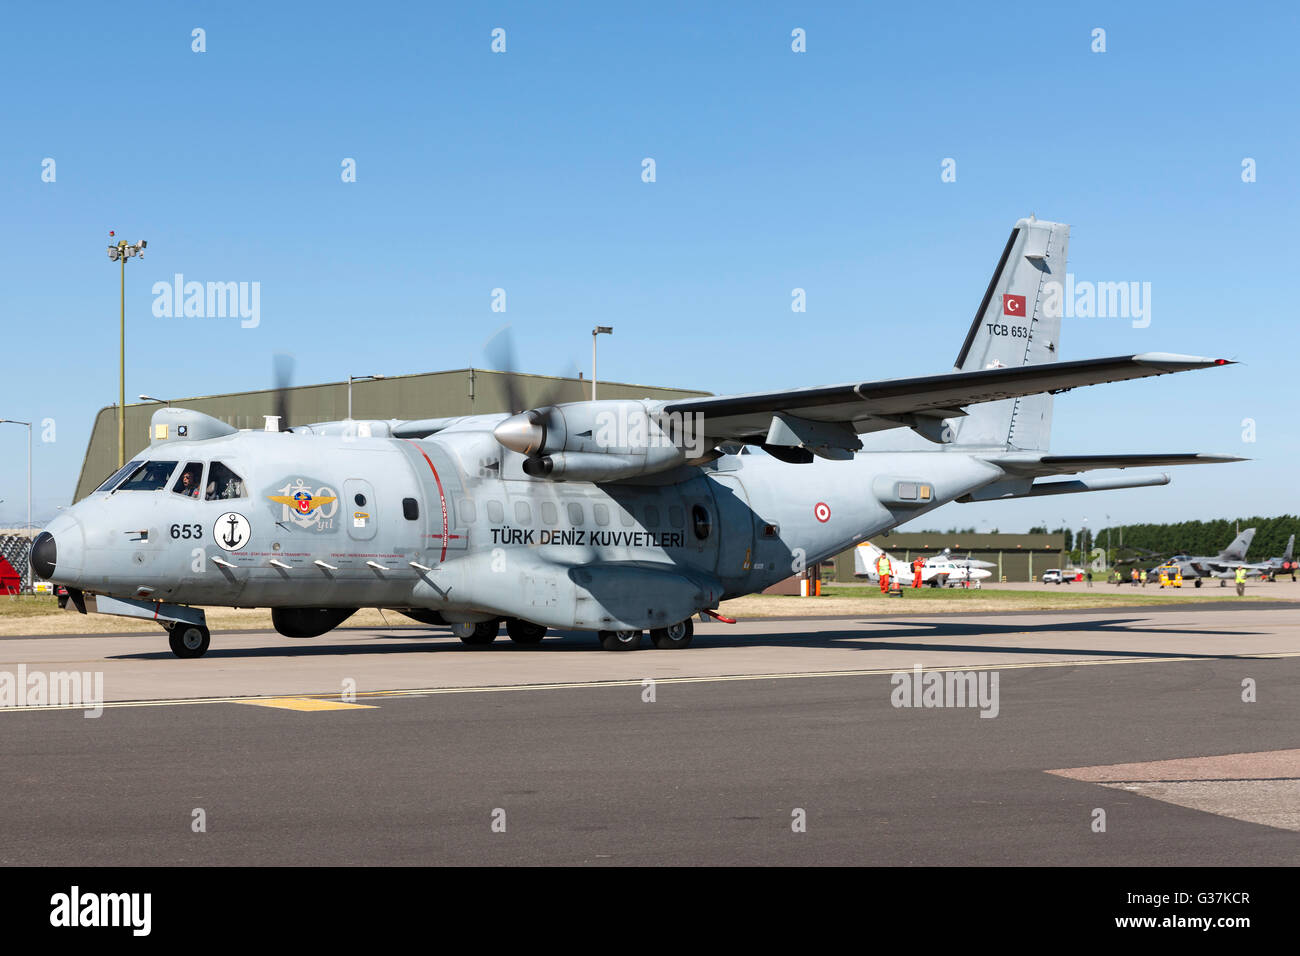 Turkish Navy (Türk Deniz Kuvvetleri) Airtech (CASA) CN-235-100MPA Maritime Patrol Aircraft. - Stock Image